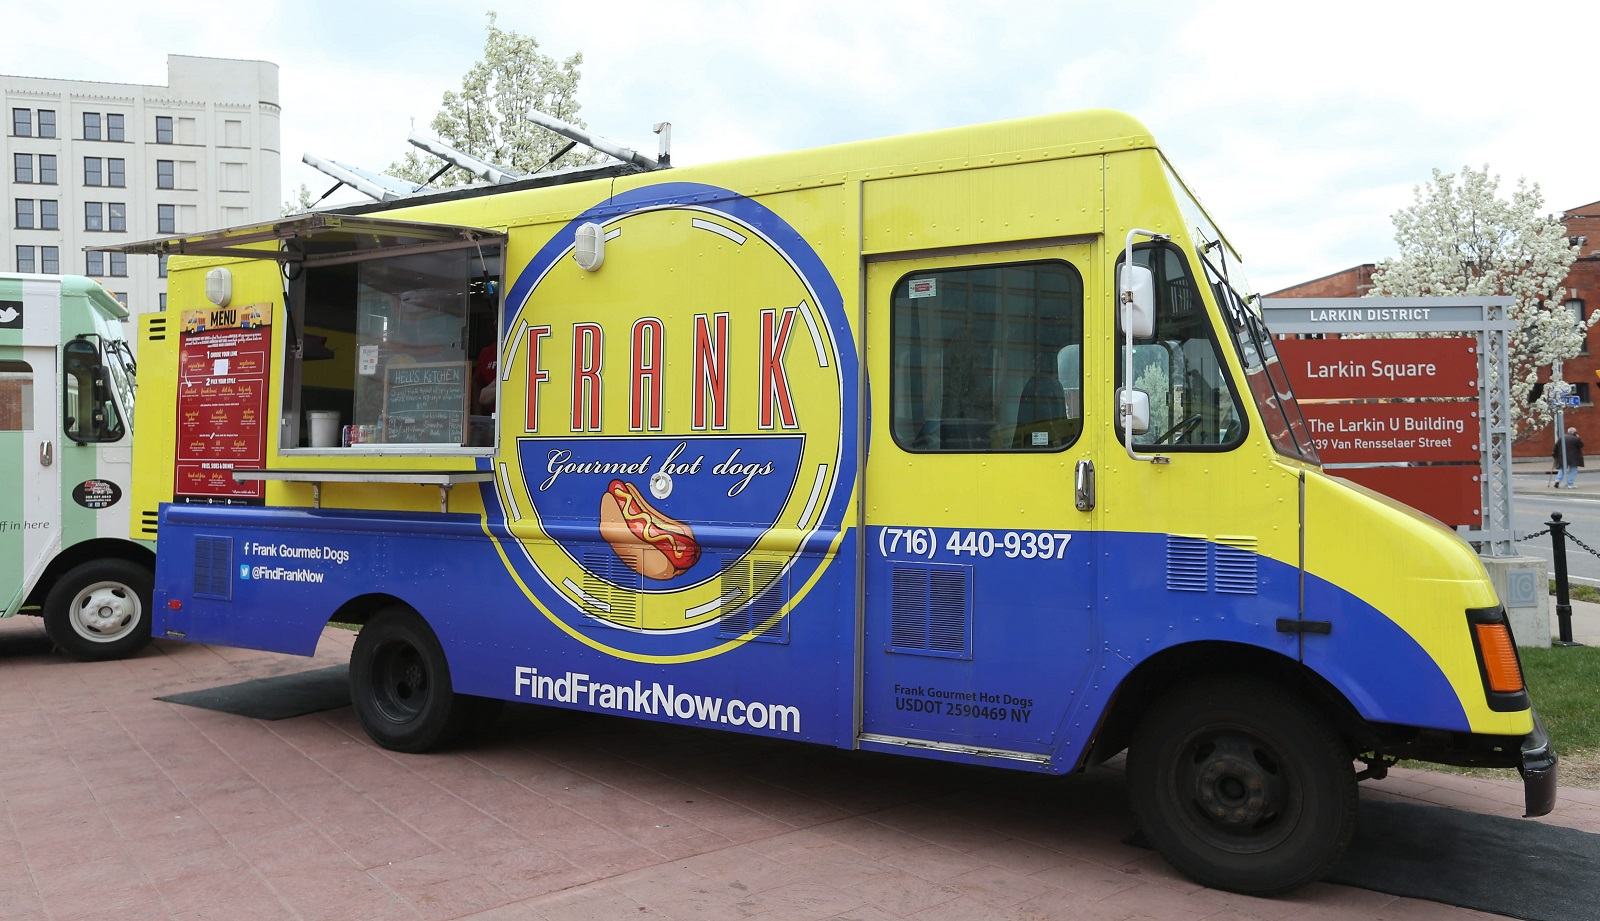 Frank Gourmet Hot Dogs Parked At Food Truck Tuesday Sharon Cantillon Buffalo News